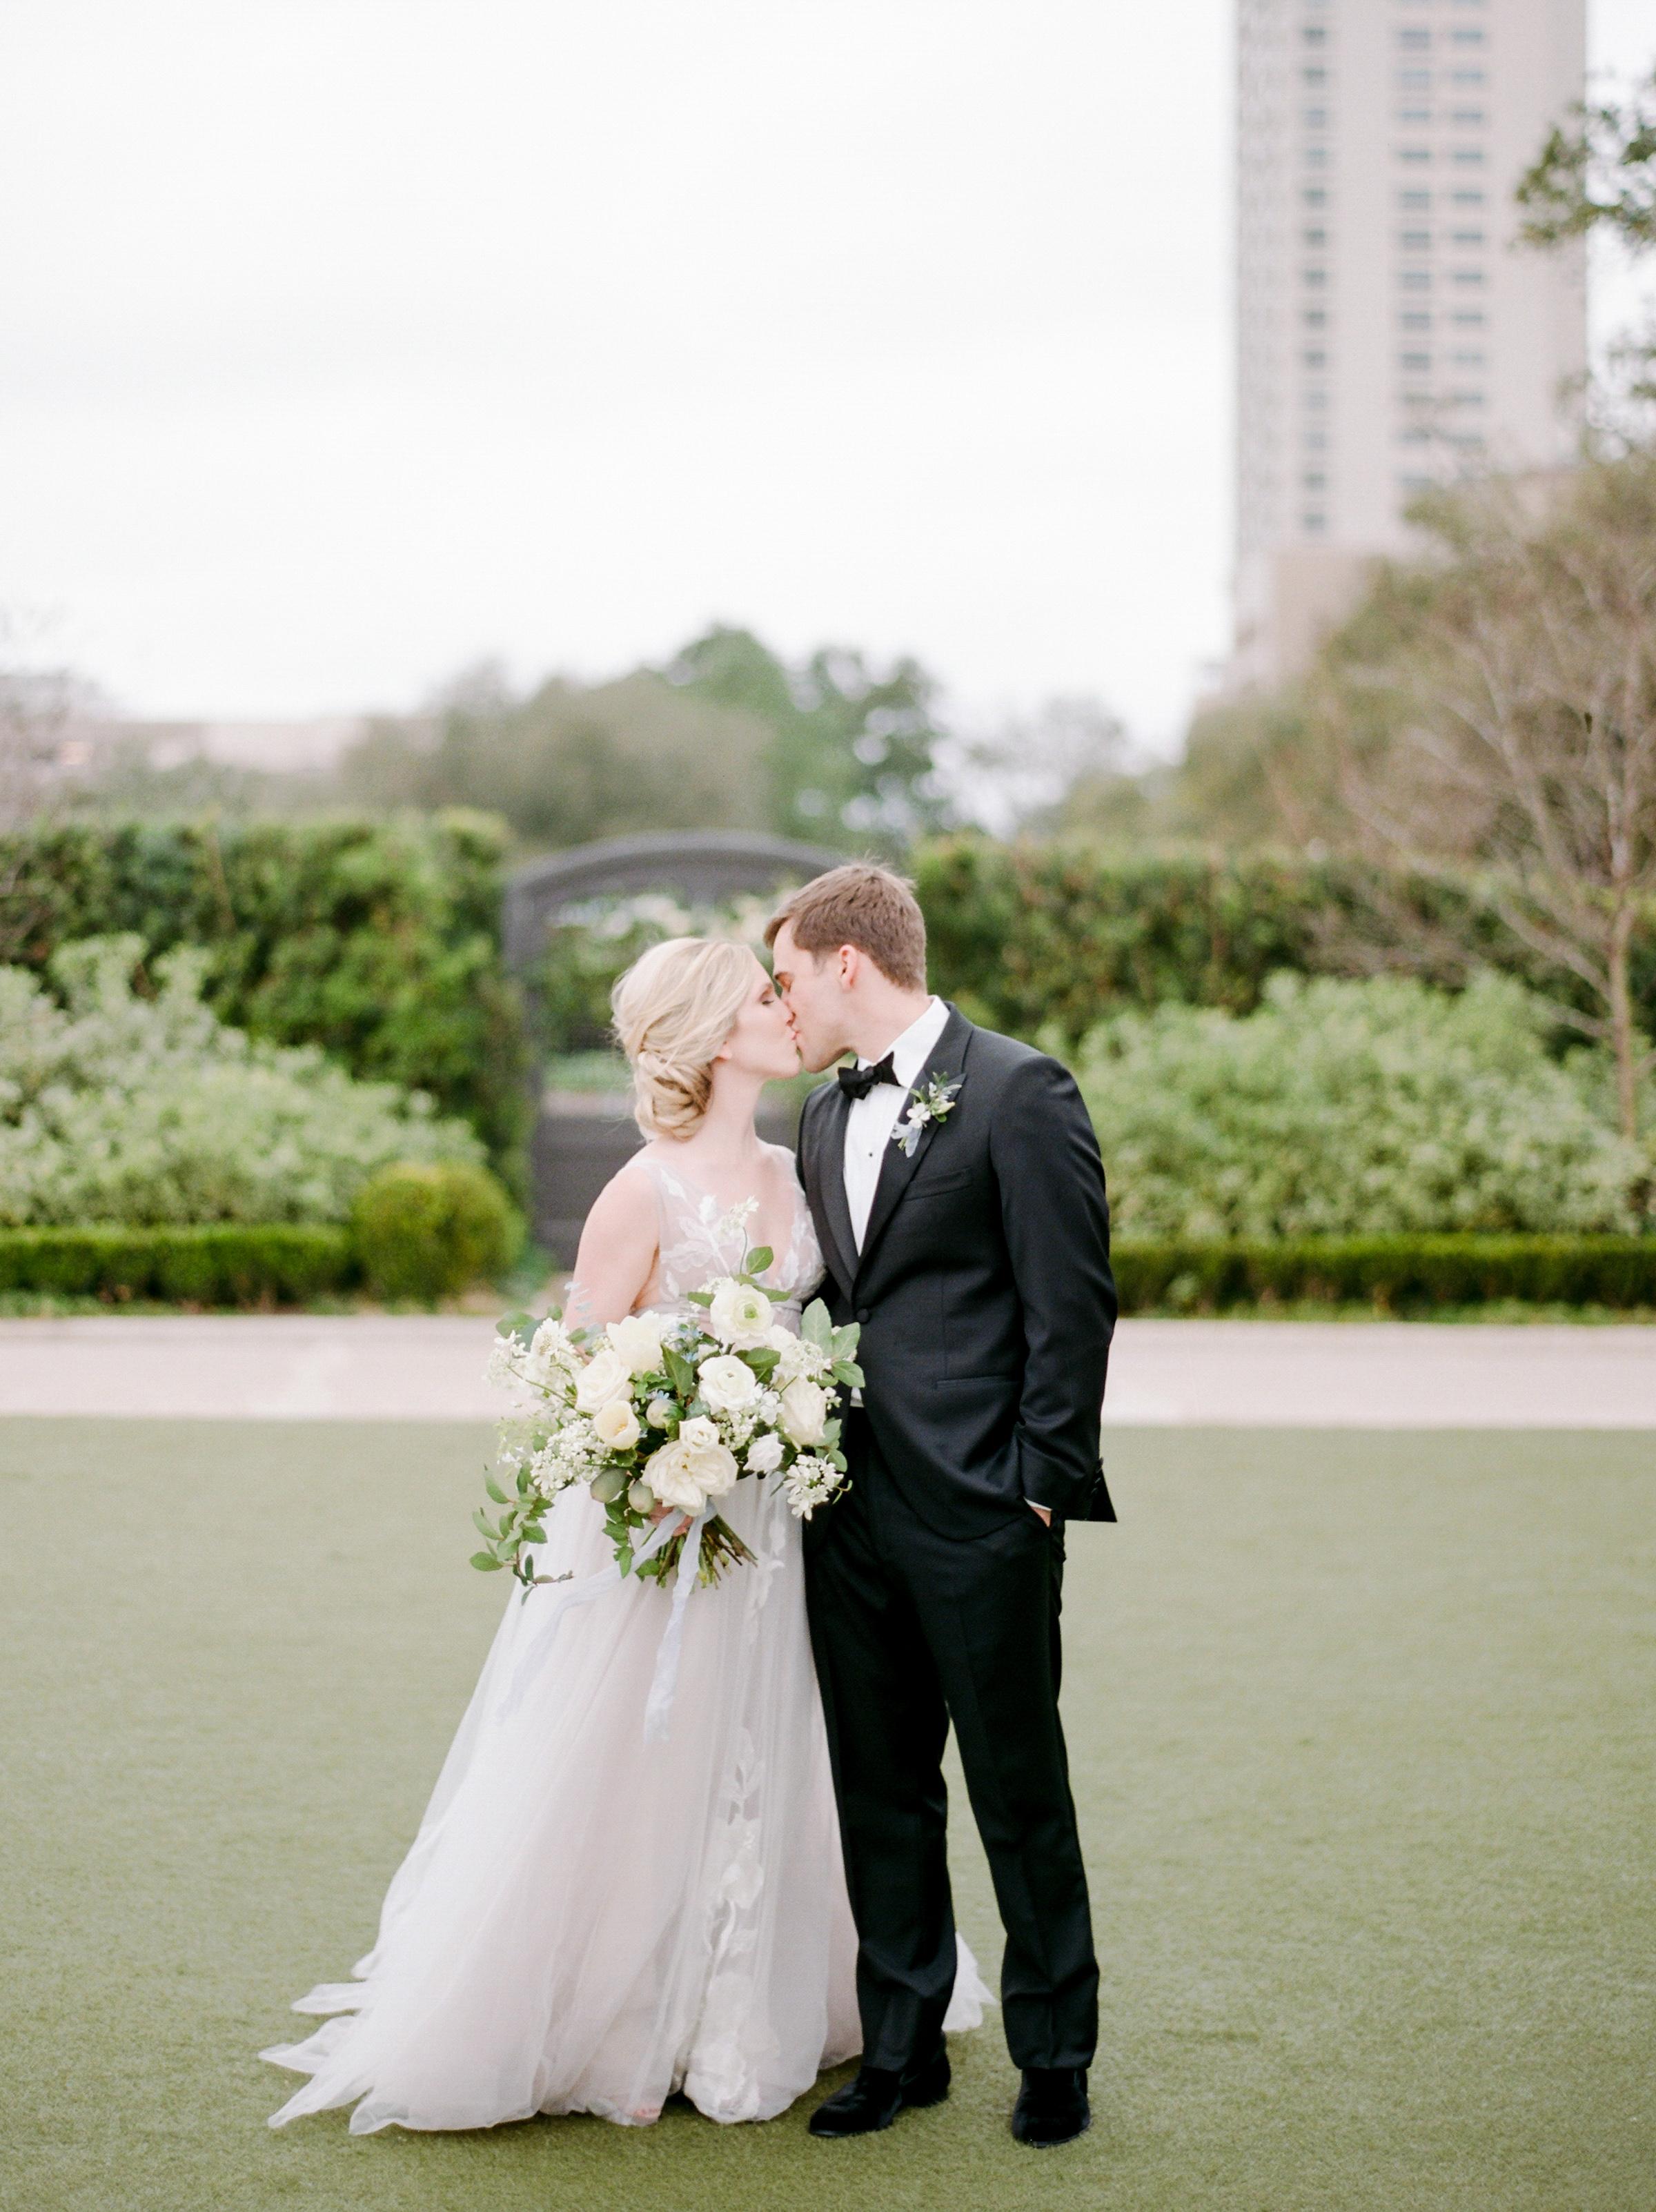 McGovern-Centennial-Gardens-Houston-Texas-Wedding-Venue-Josh-Dana-Fernandez-Photography-Film-Destination-Fine-Art-Luxury-Top-Best-Austin-Dallas-Magnolia-Rouge-Jennifer-Laura-Design-202.jpg